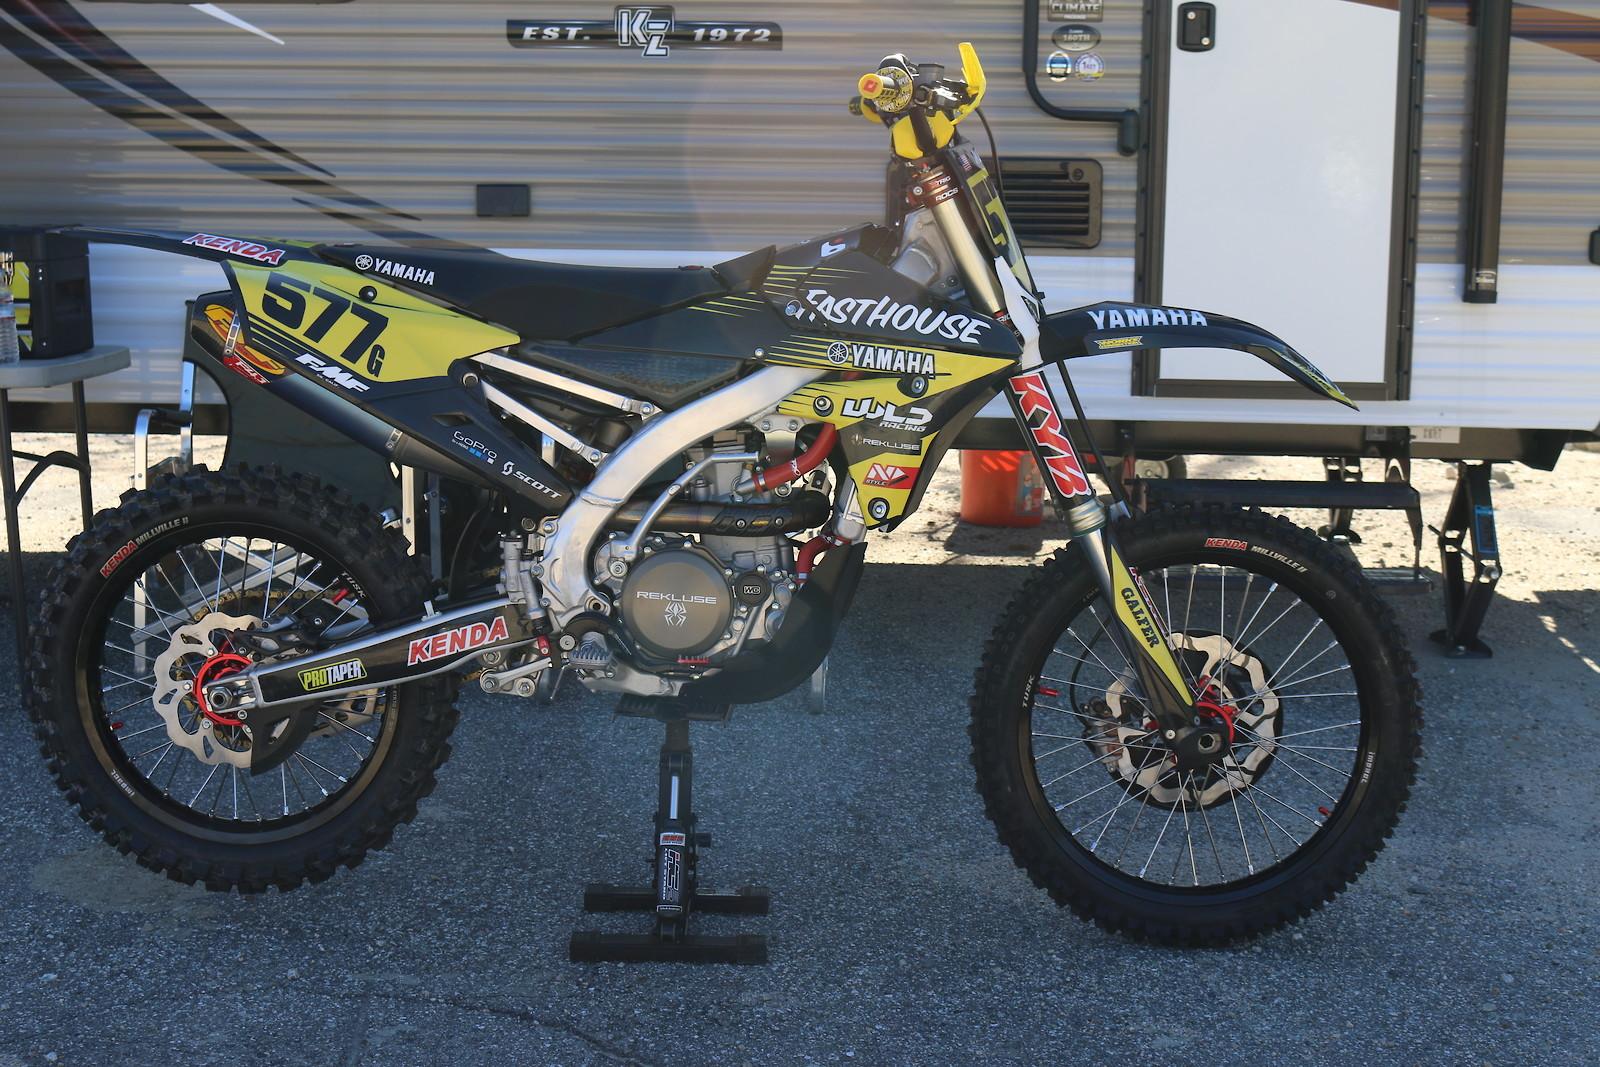 IMG 5920 - WLD - Motocross Pictures - Vital MX